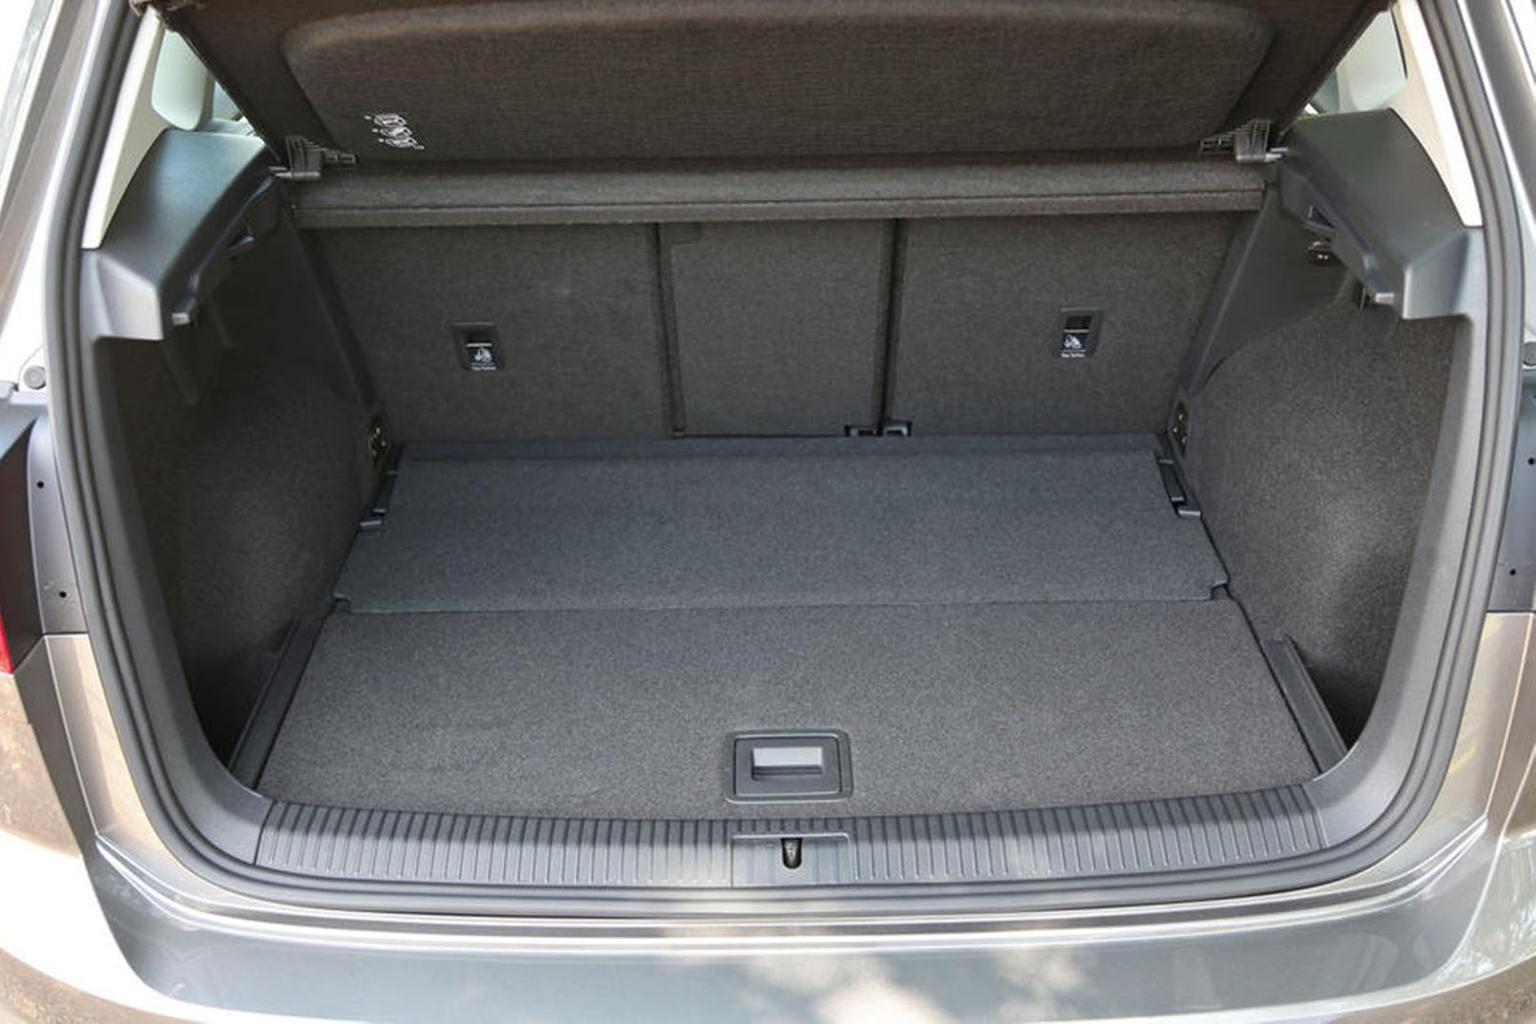 Used Volkswagen Golf SV 14-present